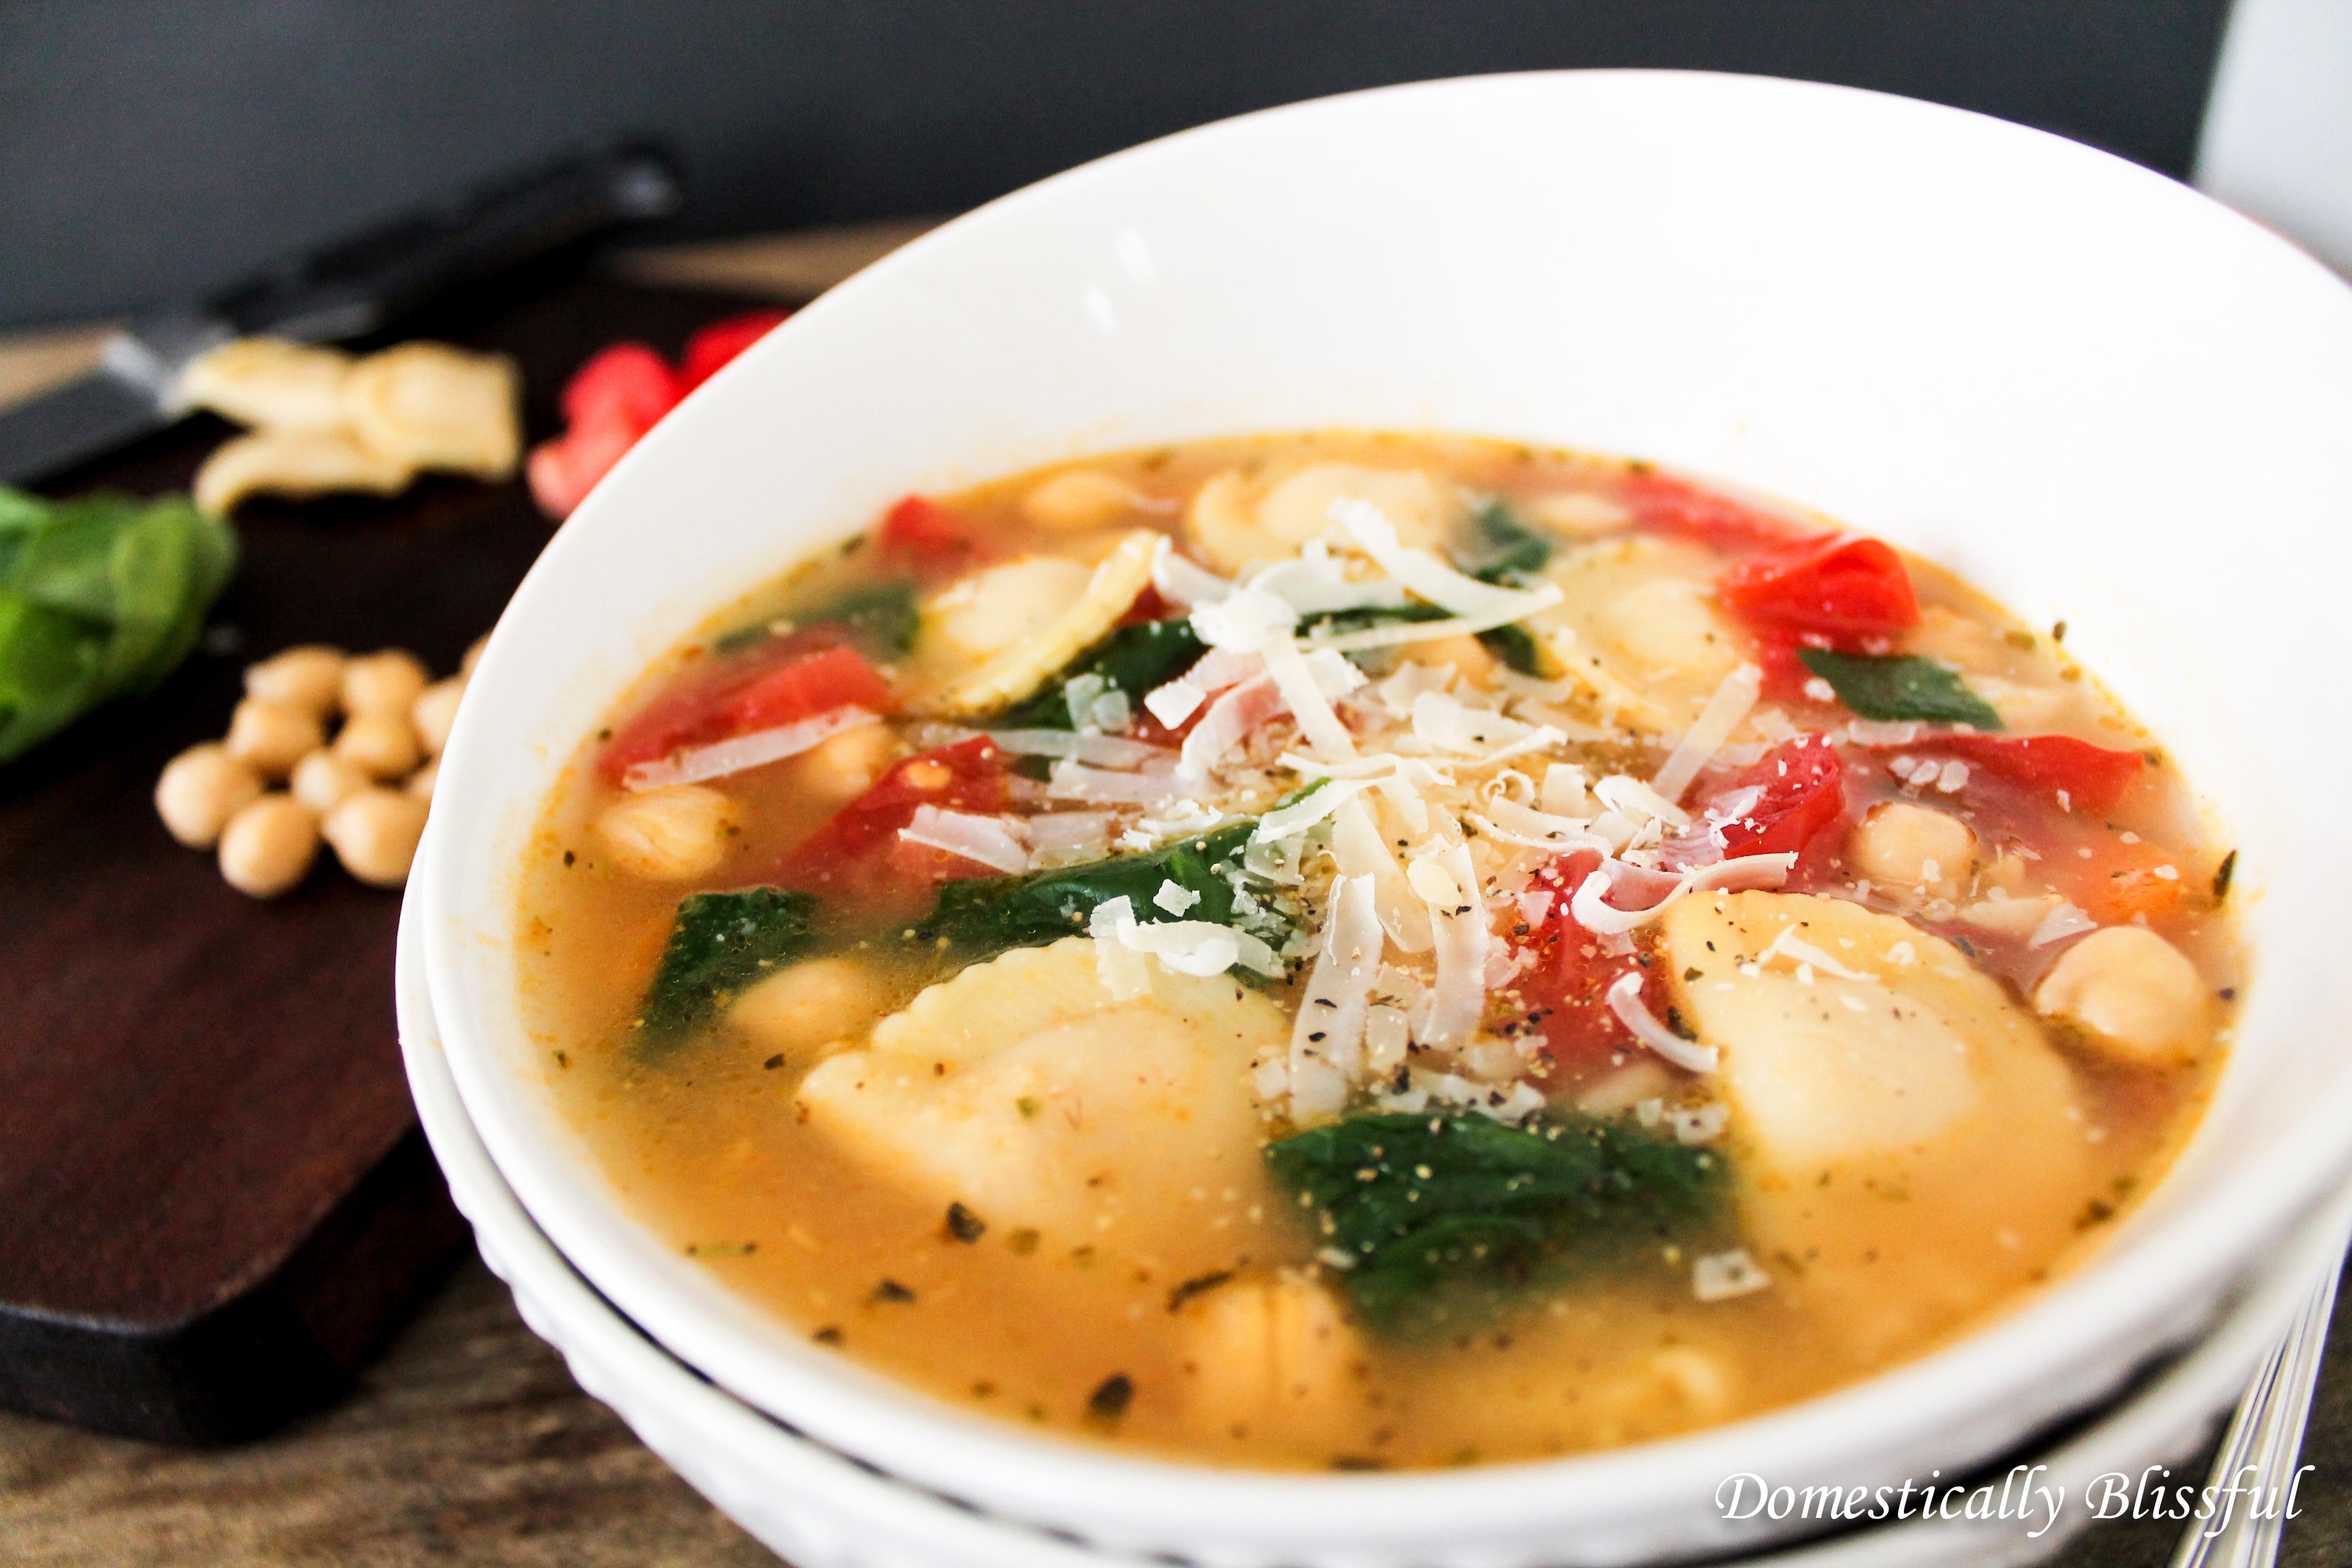 Ravioli Garden Soup